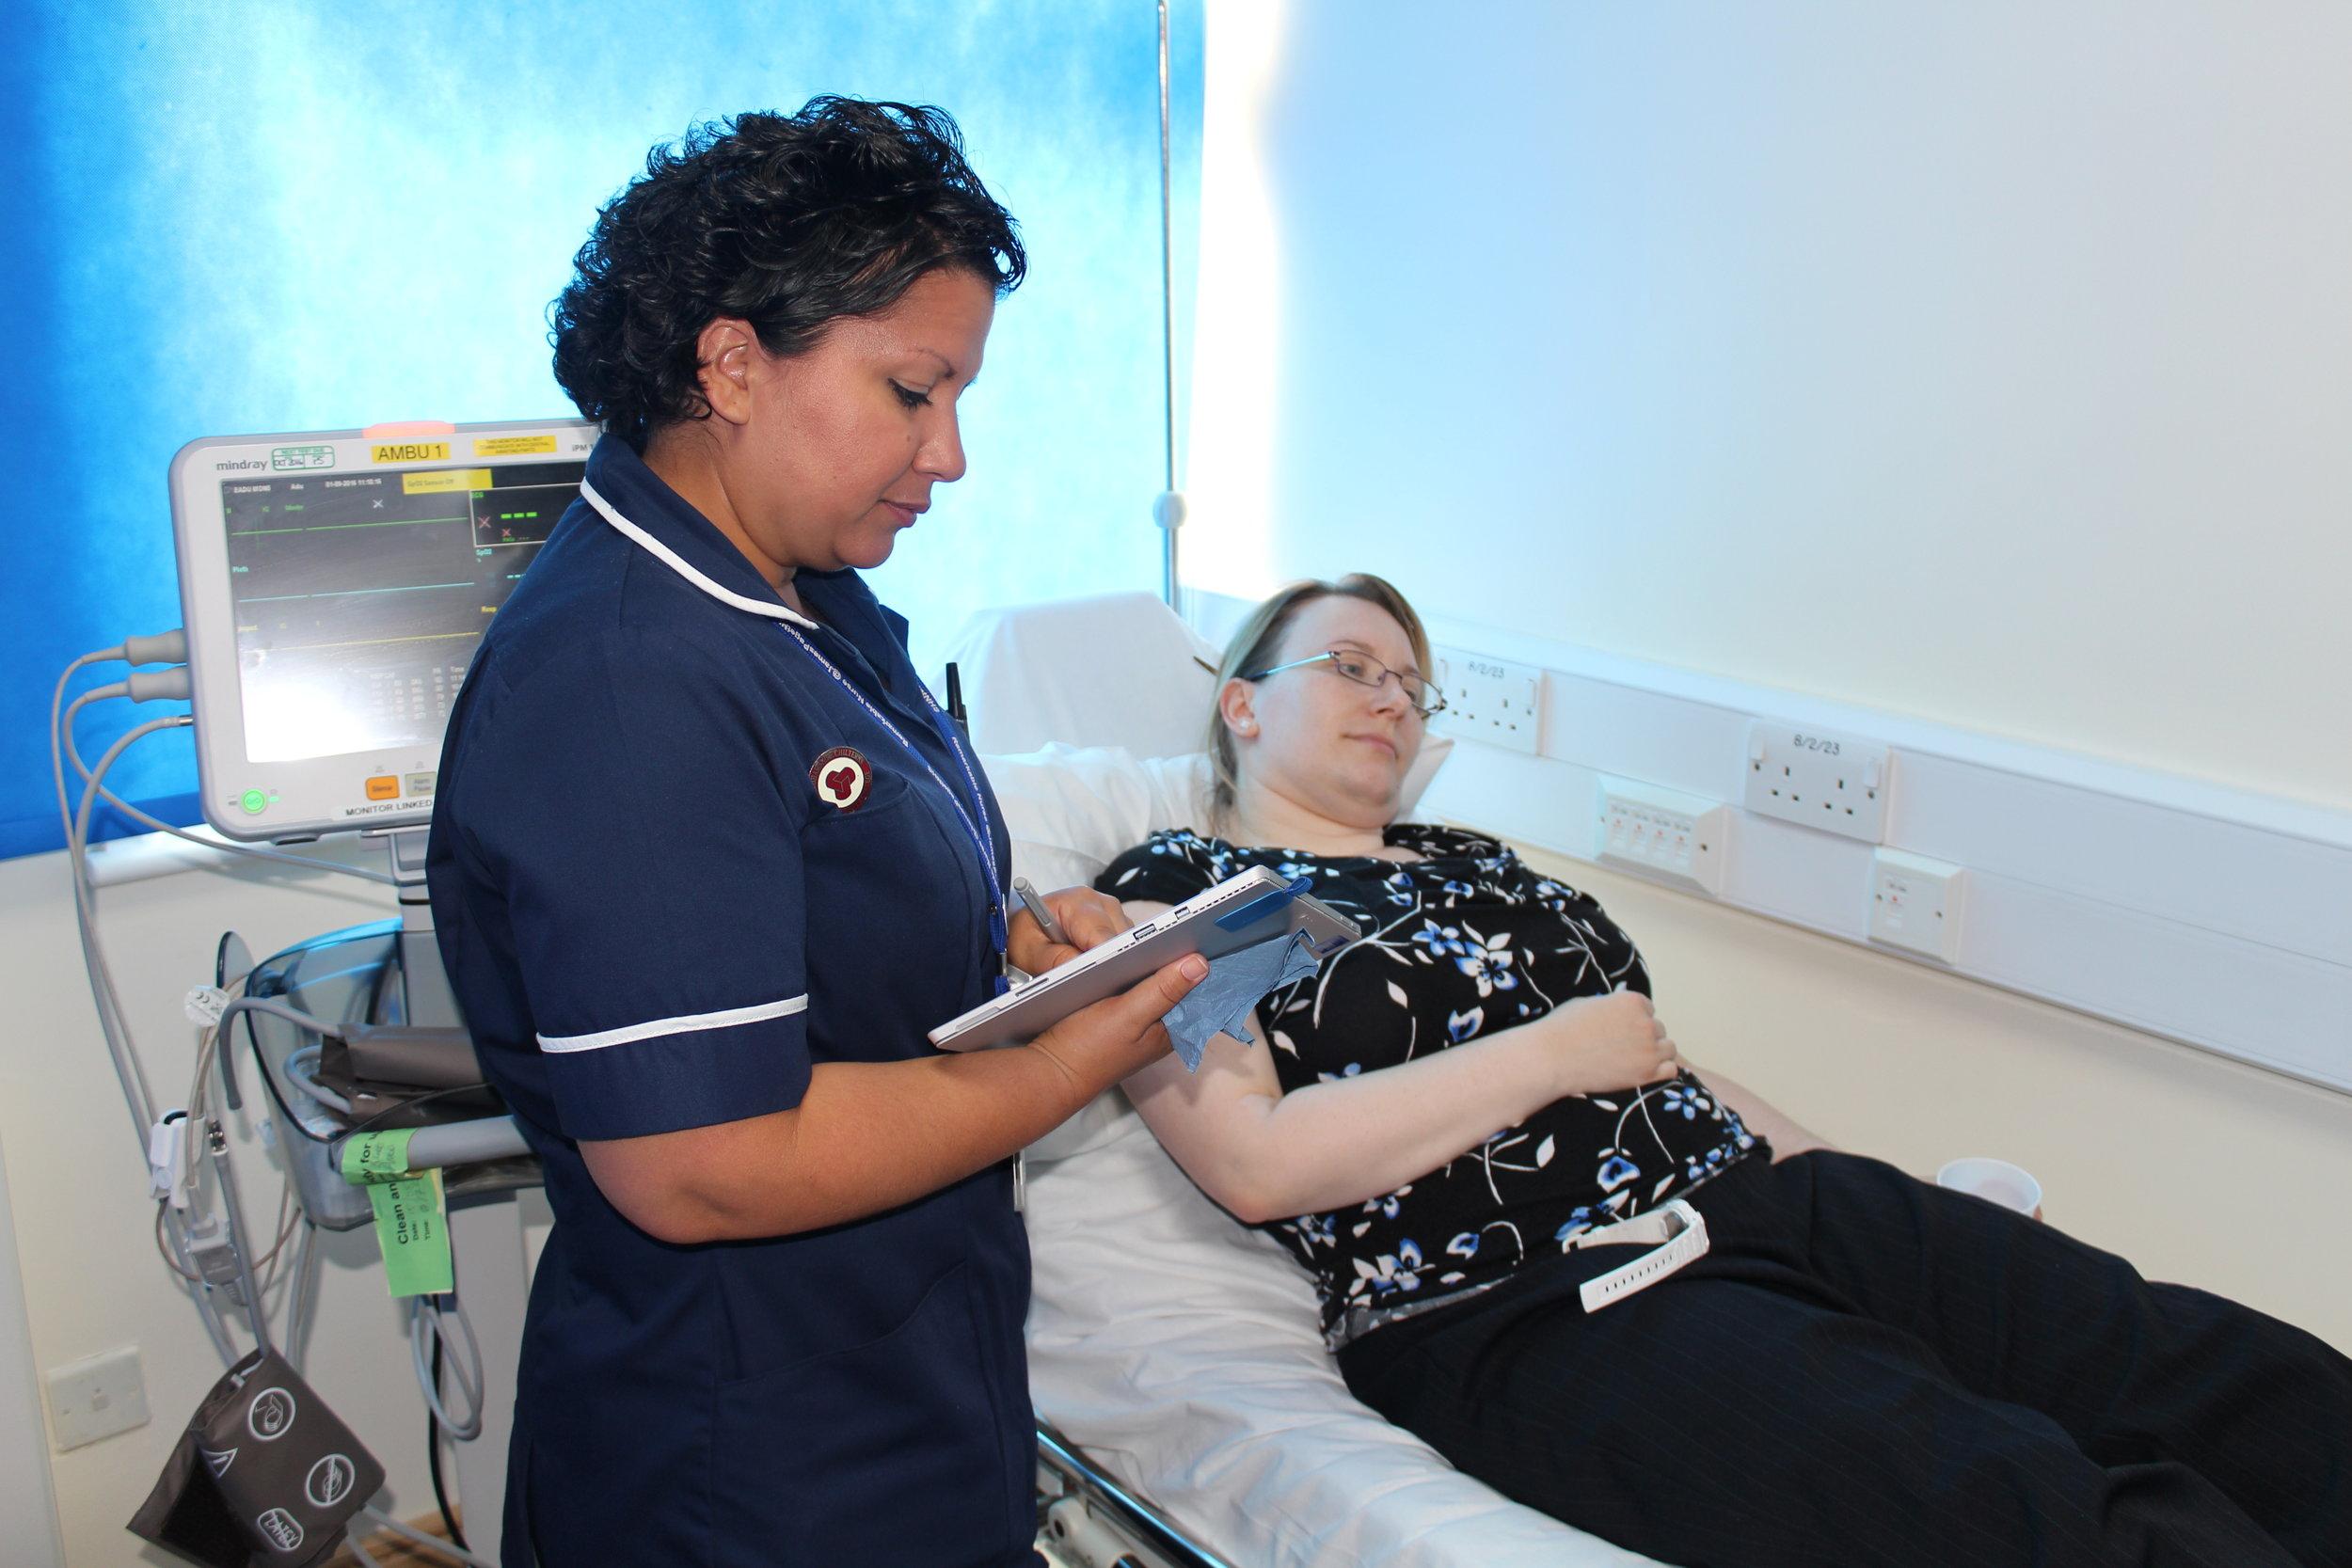 JPUH Ambulatory Care Unit Nurse Practitioner Karen Foden taking case notes on a patient (Photography by Laura Crisp)